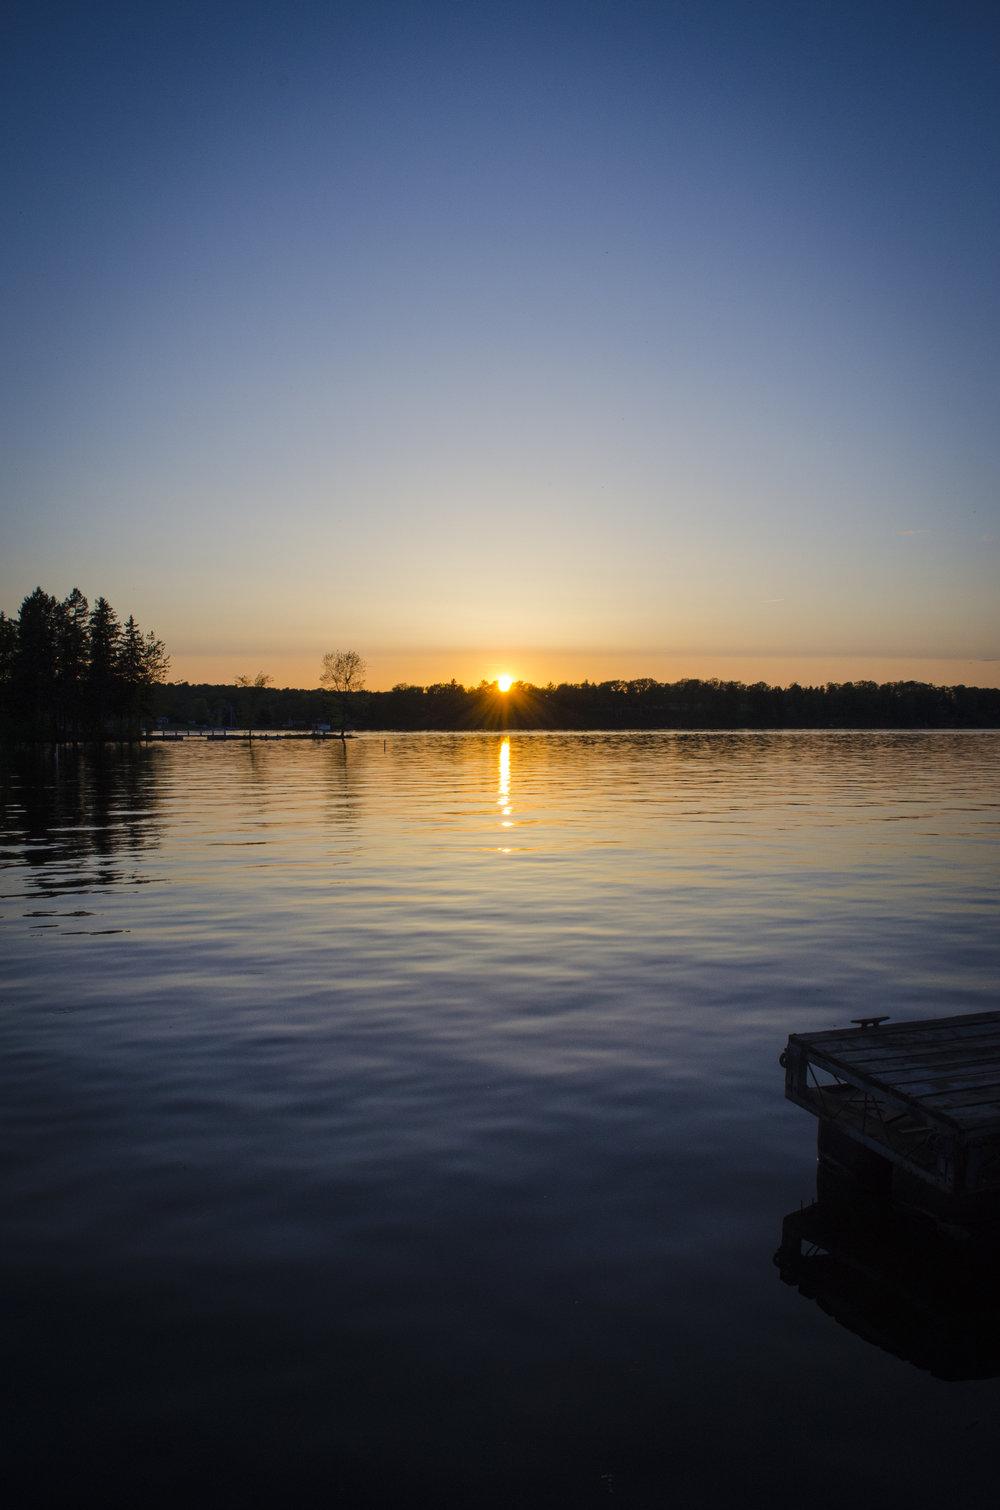 sunset-on-the-bay_14098734550_o.jpg